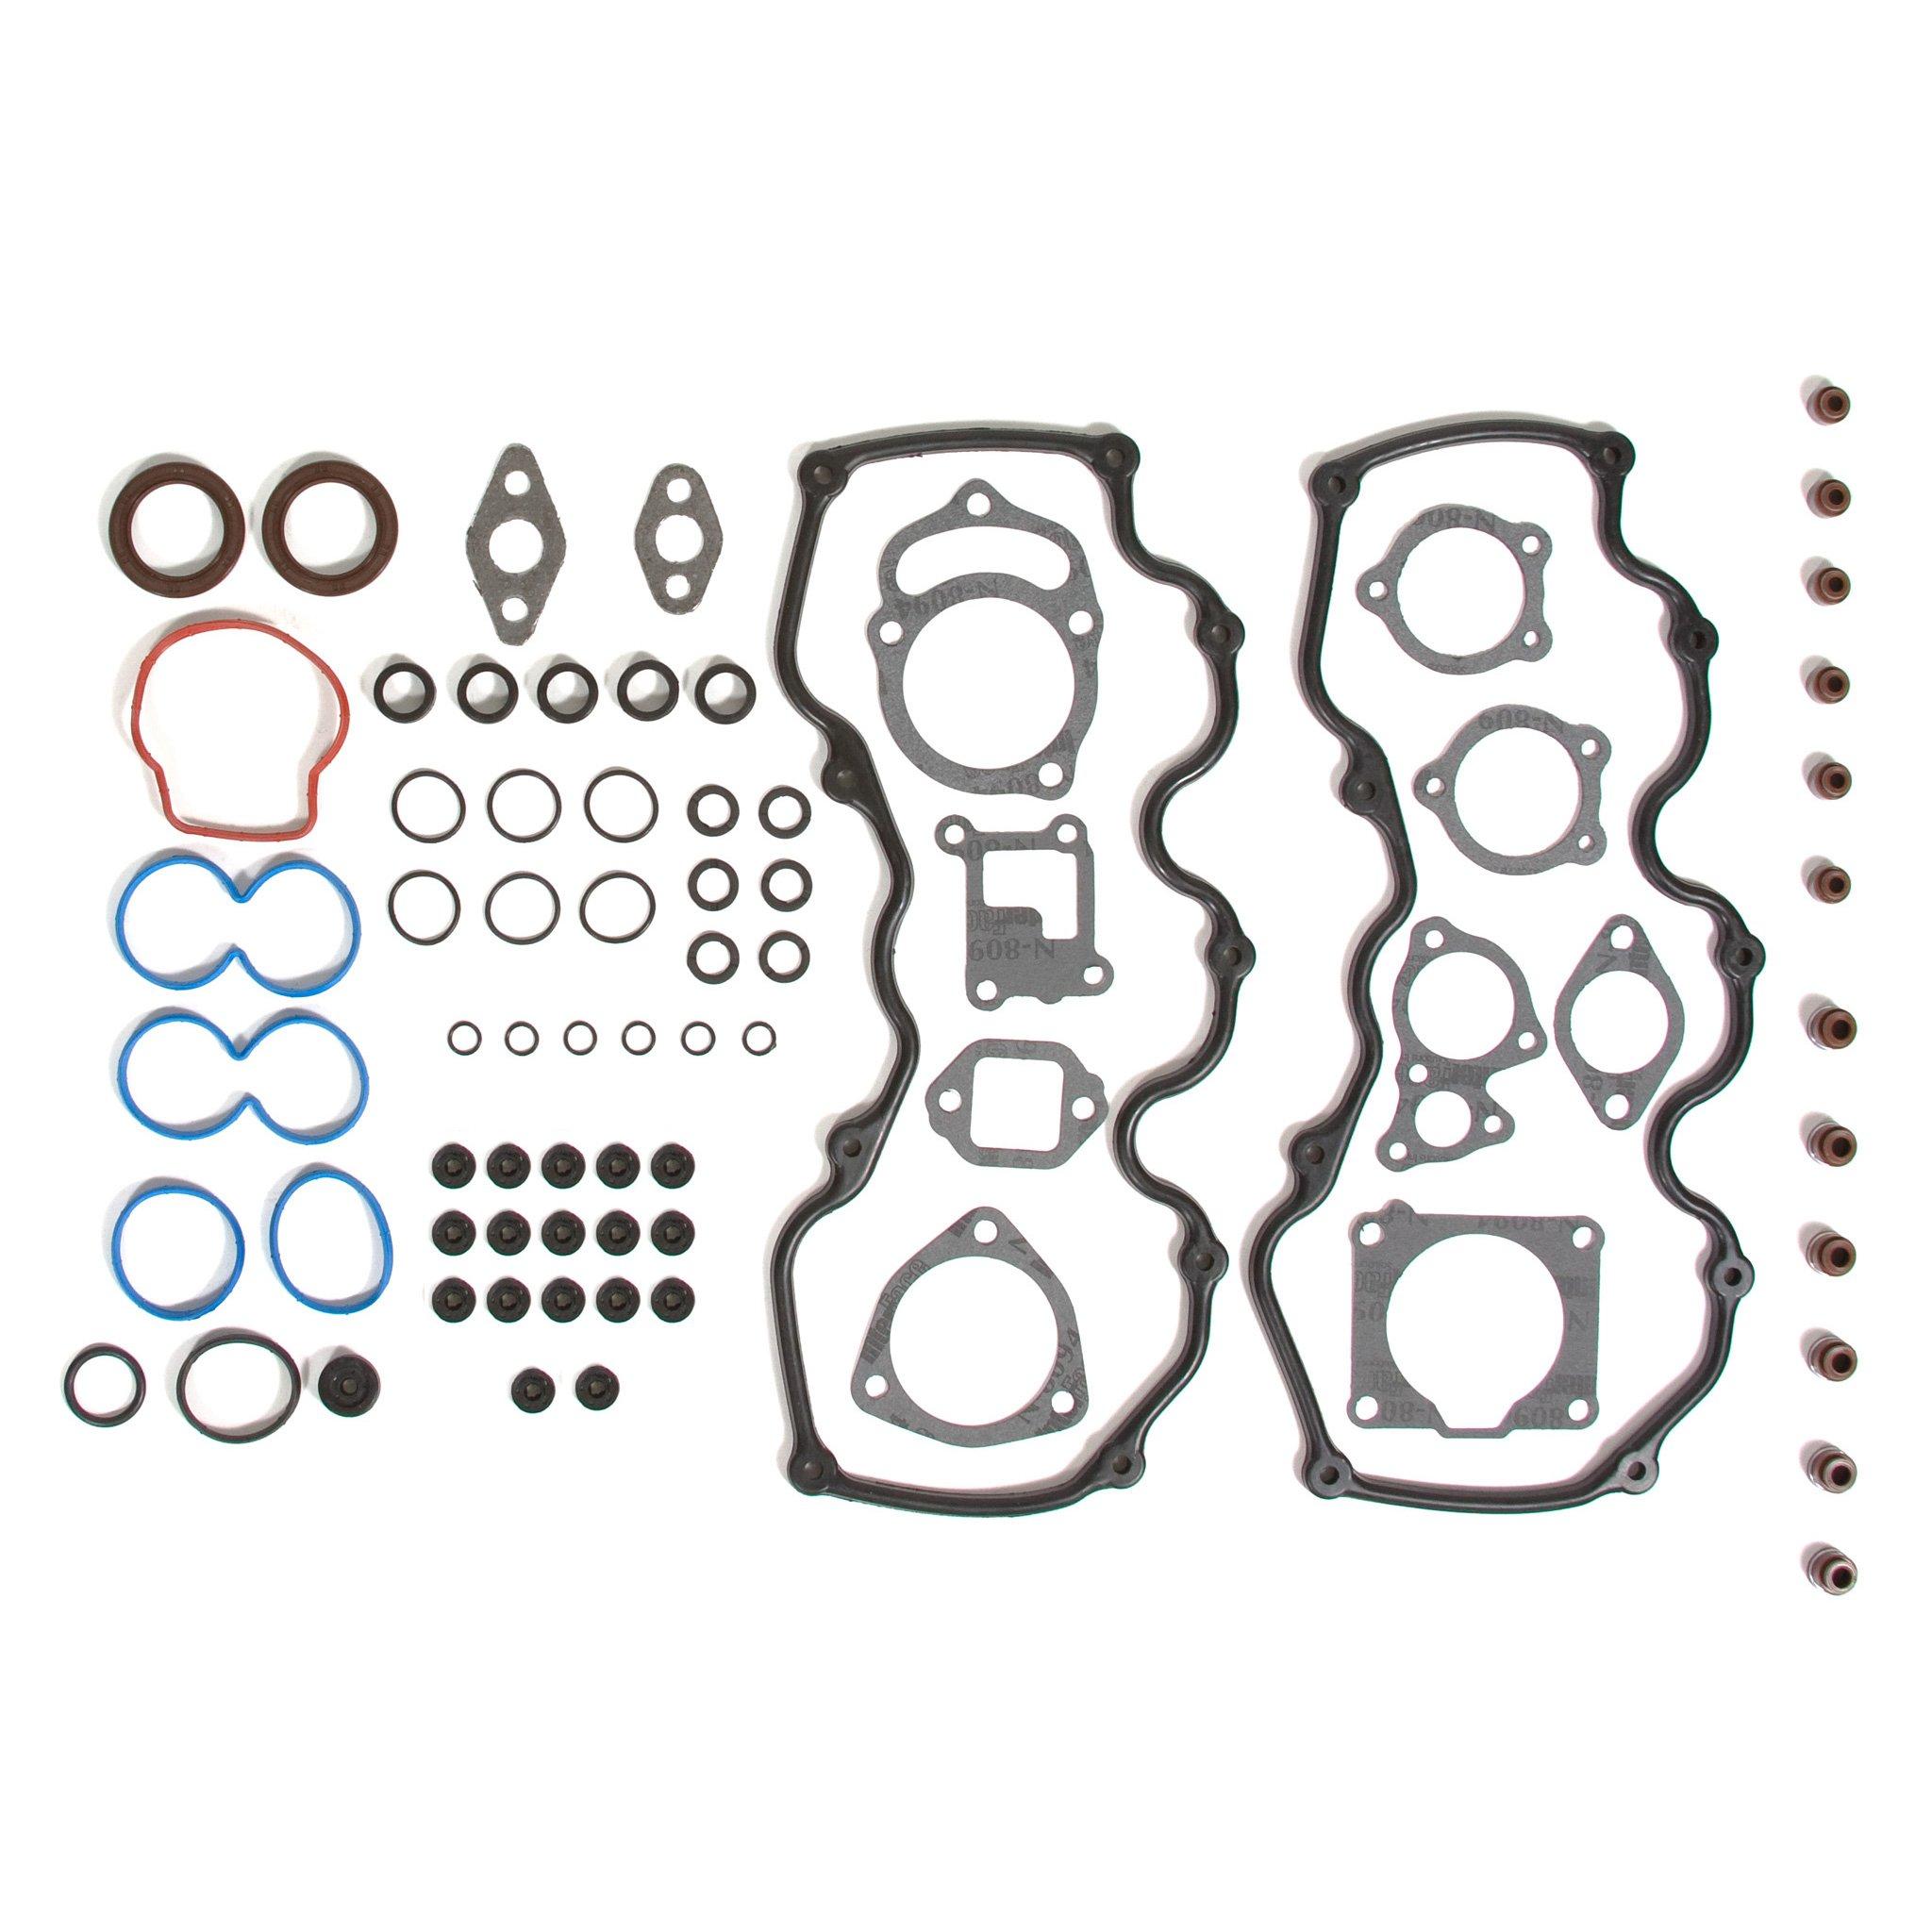 Standard Size Evergreen RS3021-EVE.STD Fits 96-04 Nissan Pathfinder Frontier Quest Infiniti QX4 3.3L VG33E Engine Piston Ring Set